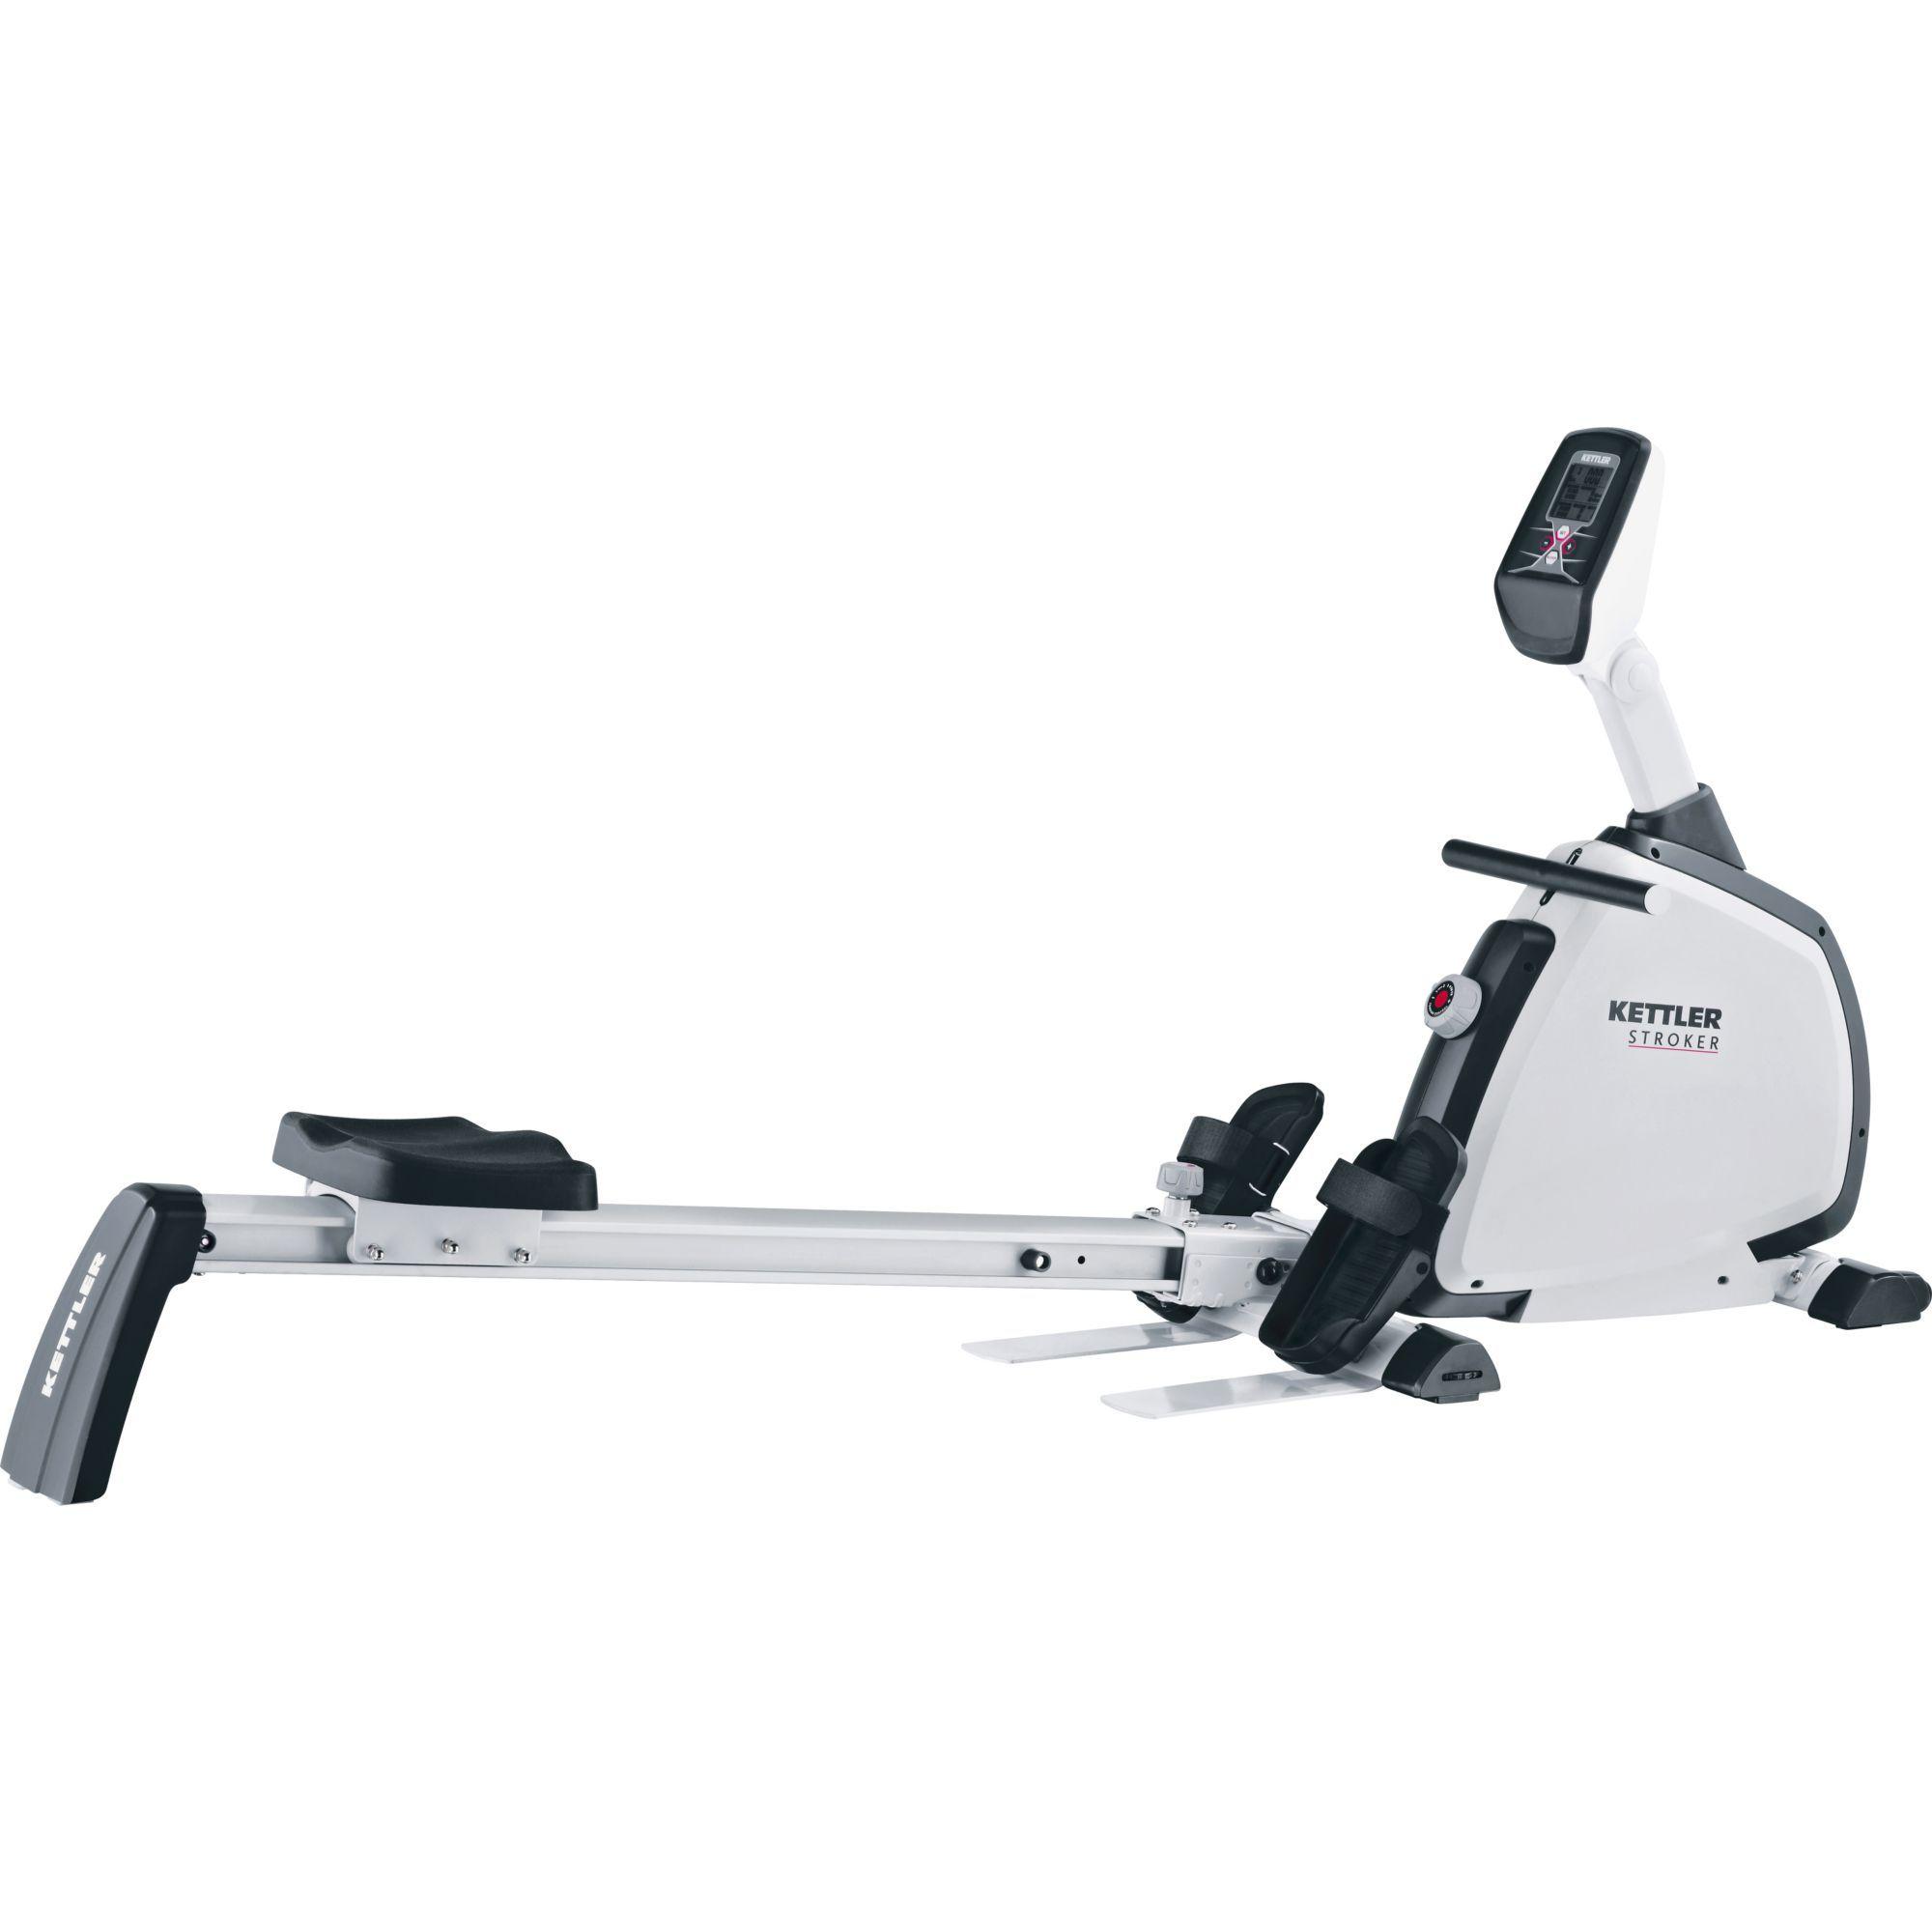 Kettler Stroker Rowing Machine Sweatband Com